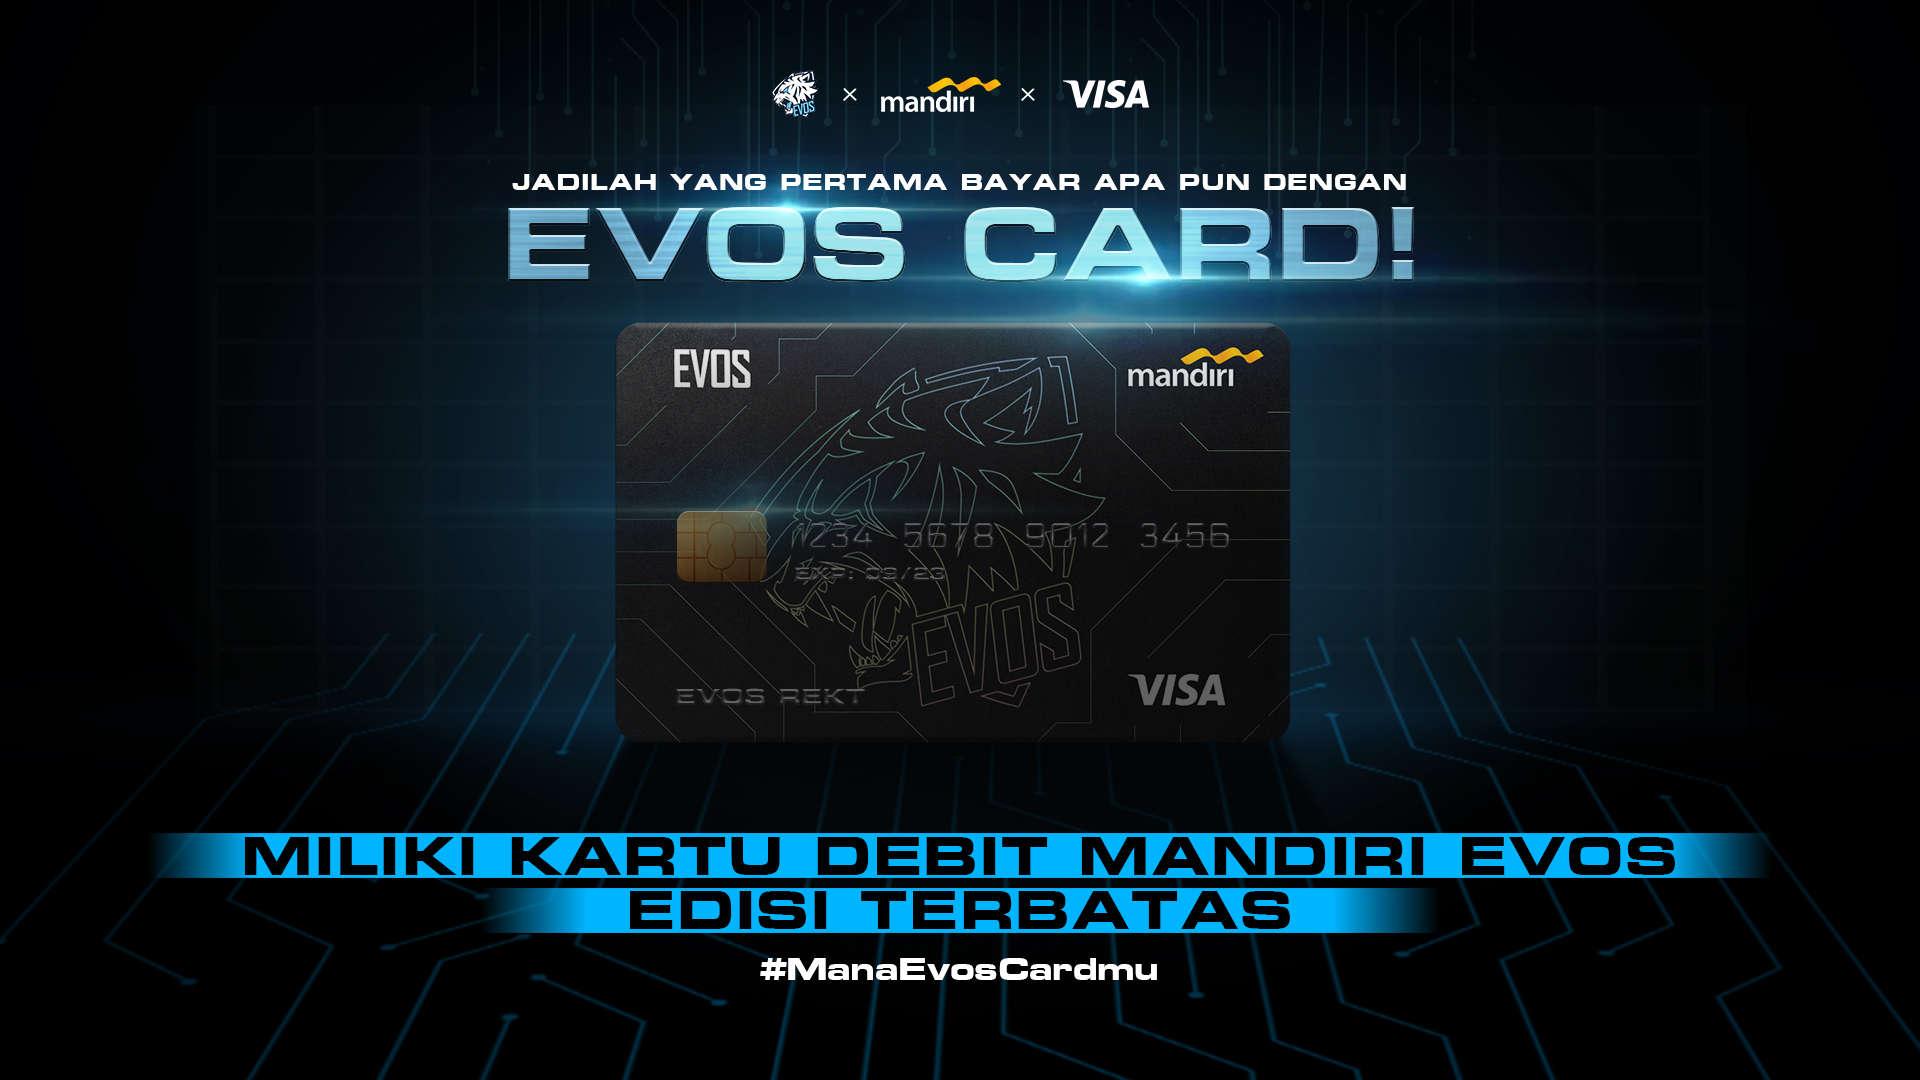 EVOS Esports X Mandiri X VISA